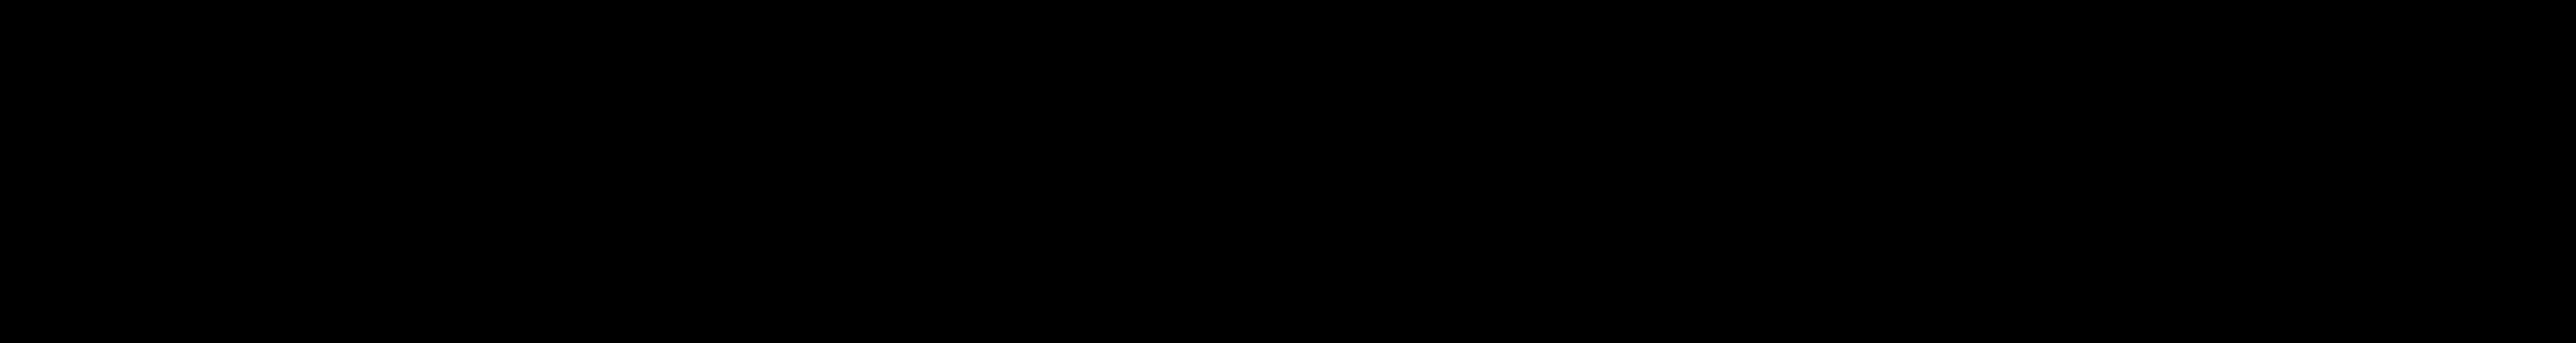 P790 Blk